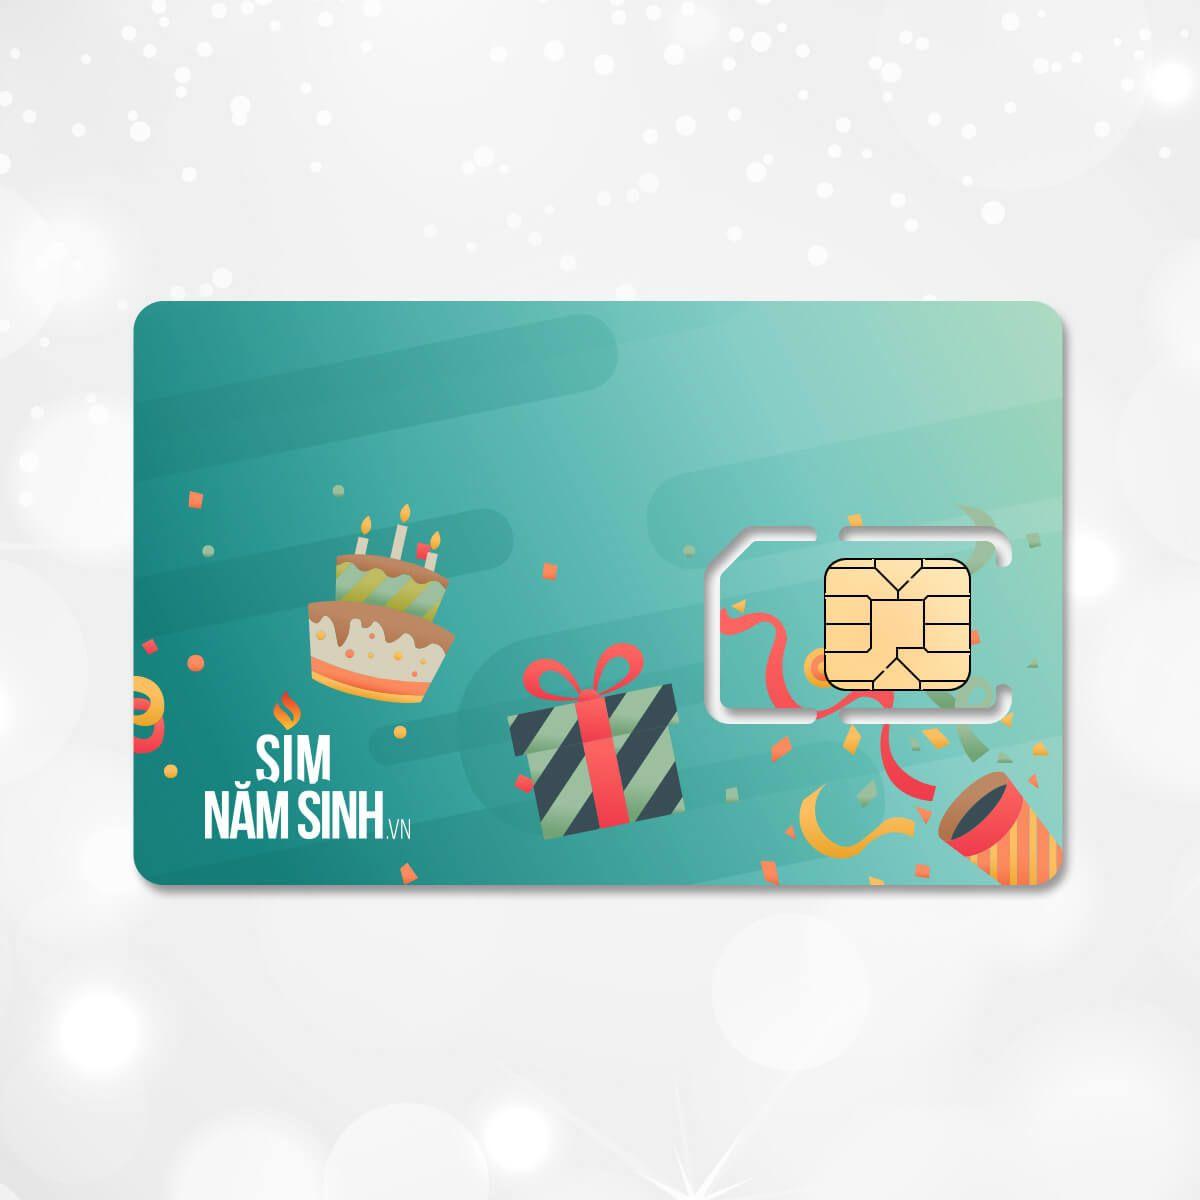 blank-sim-card-simnamsinh